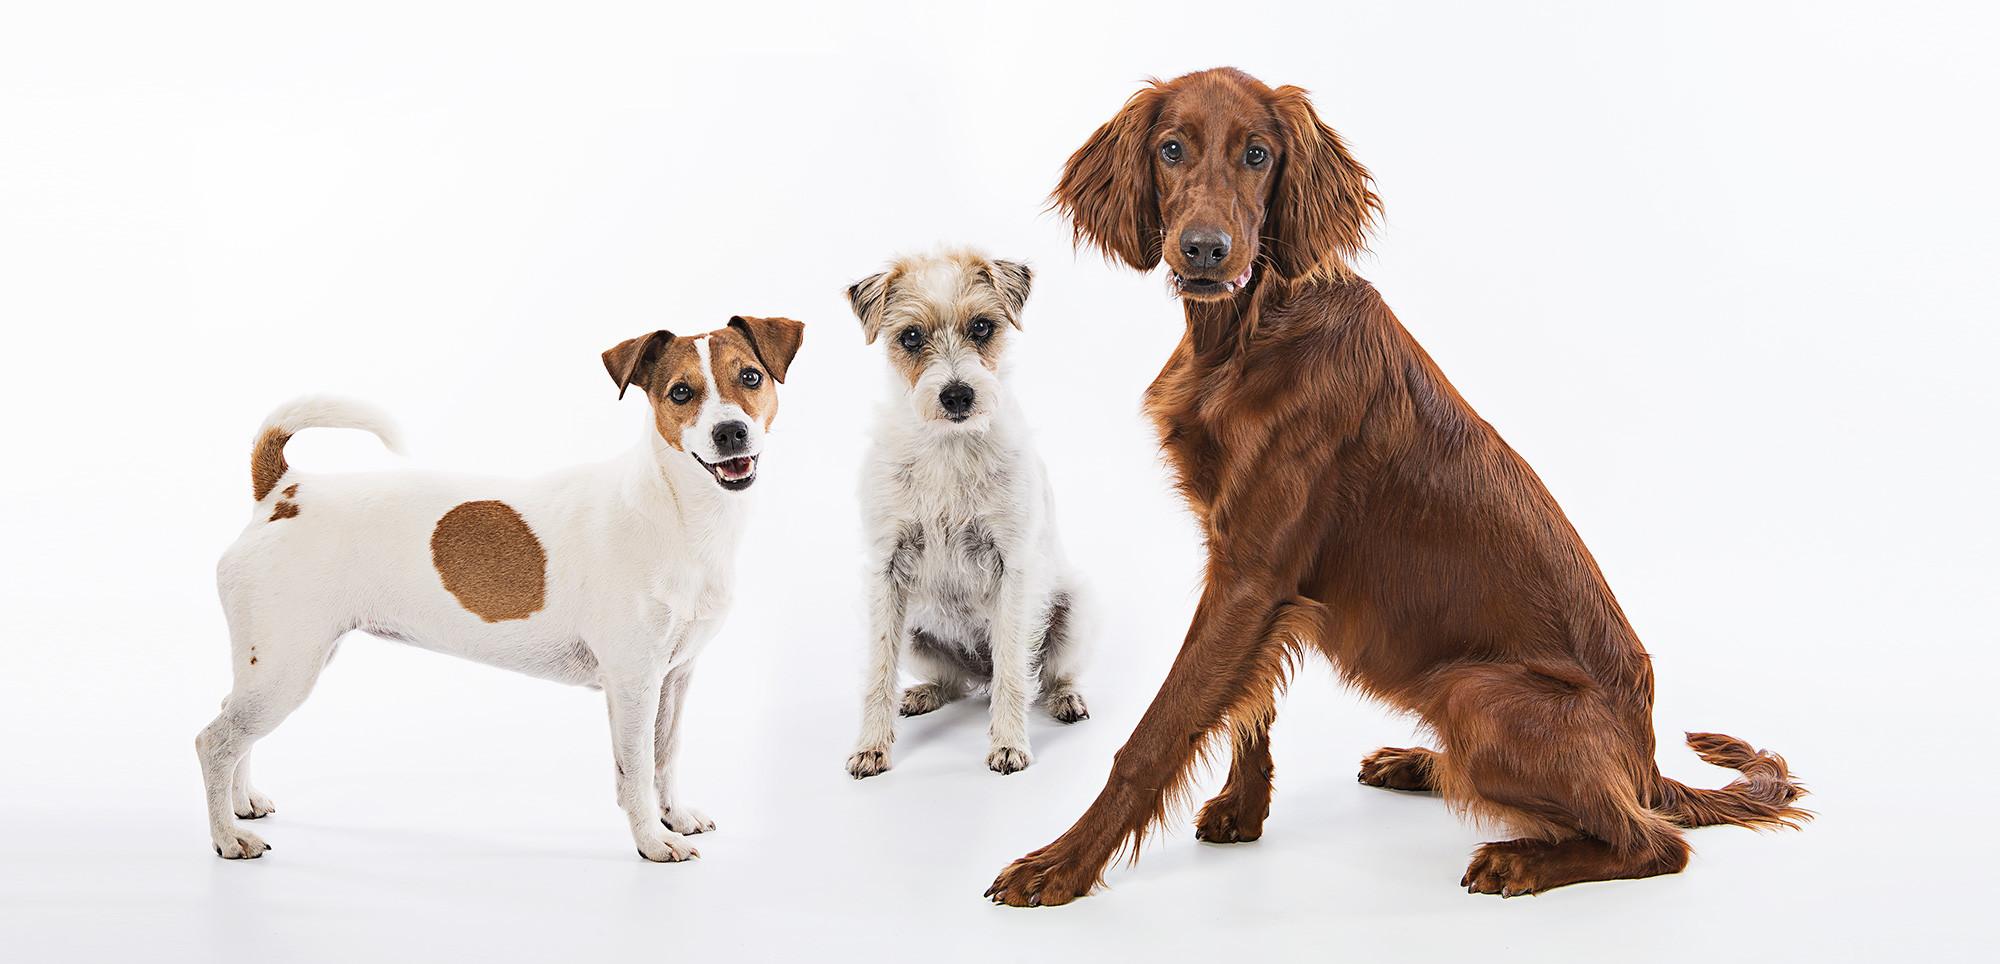 Drei_Hunde.jpg